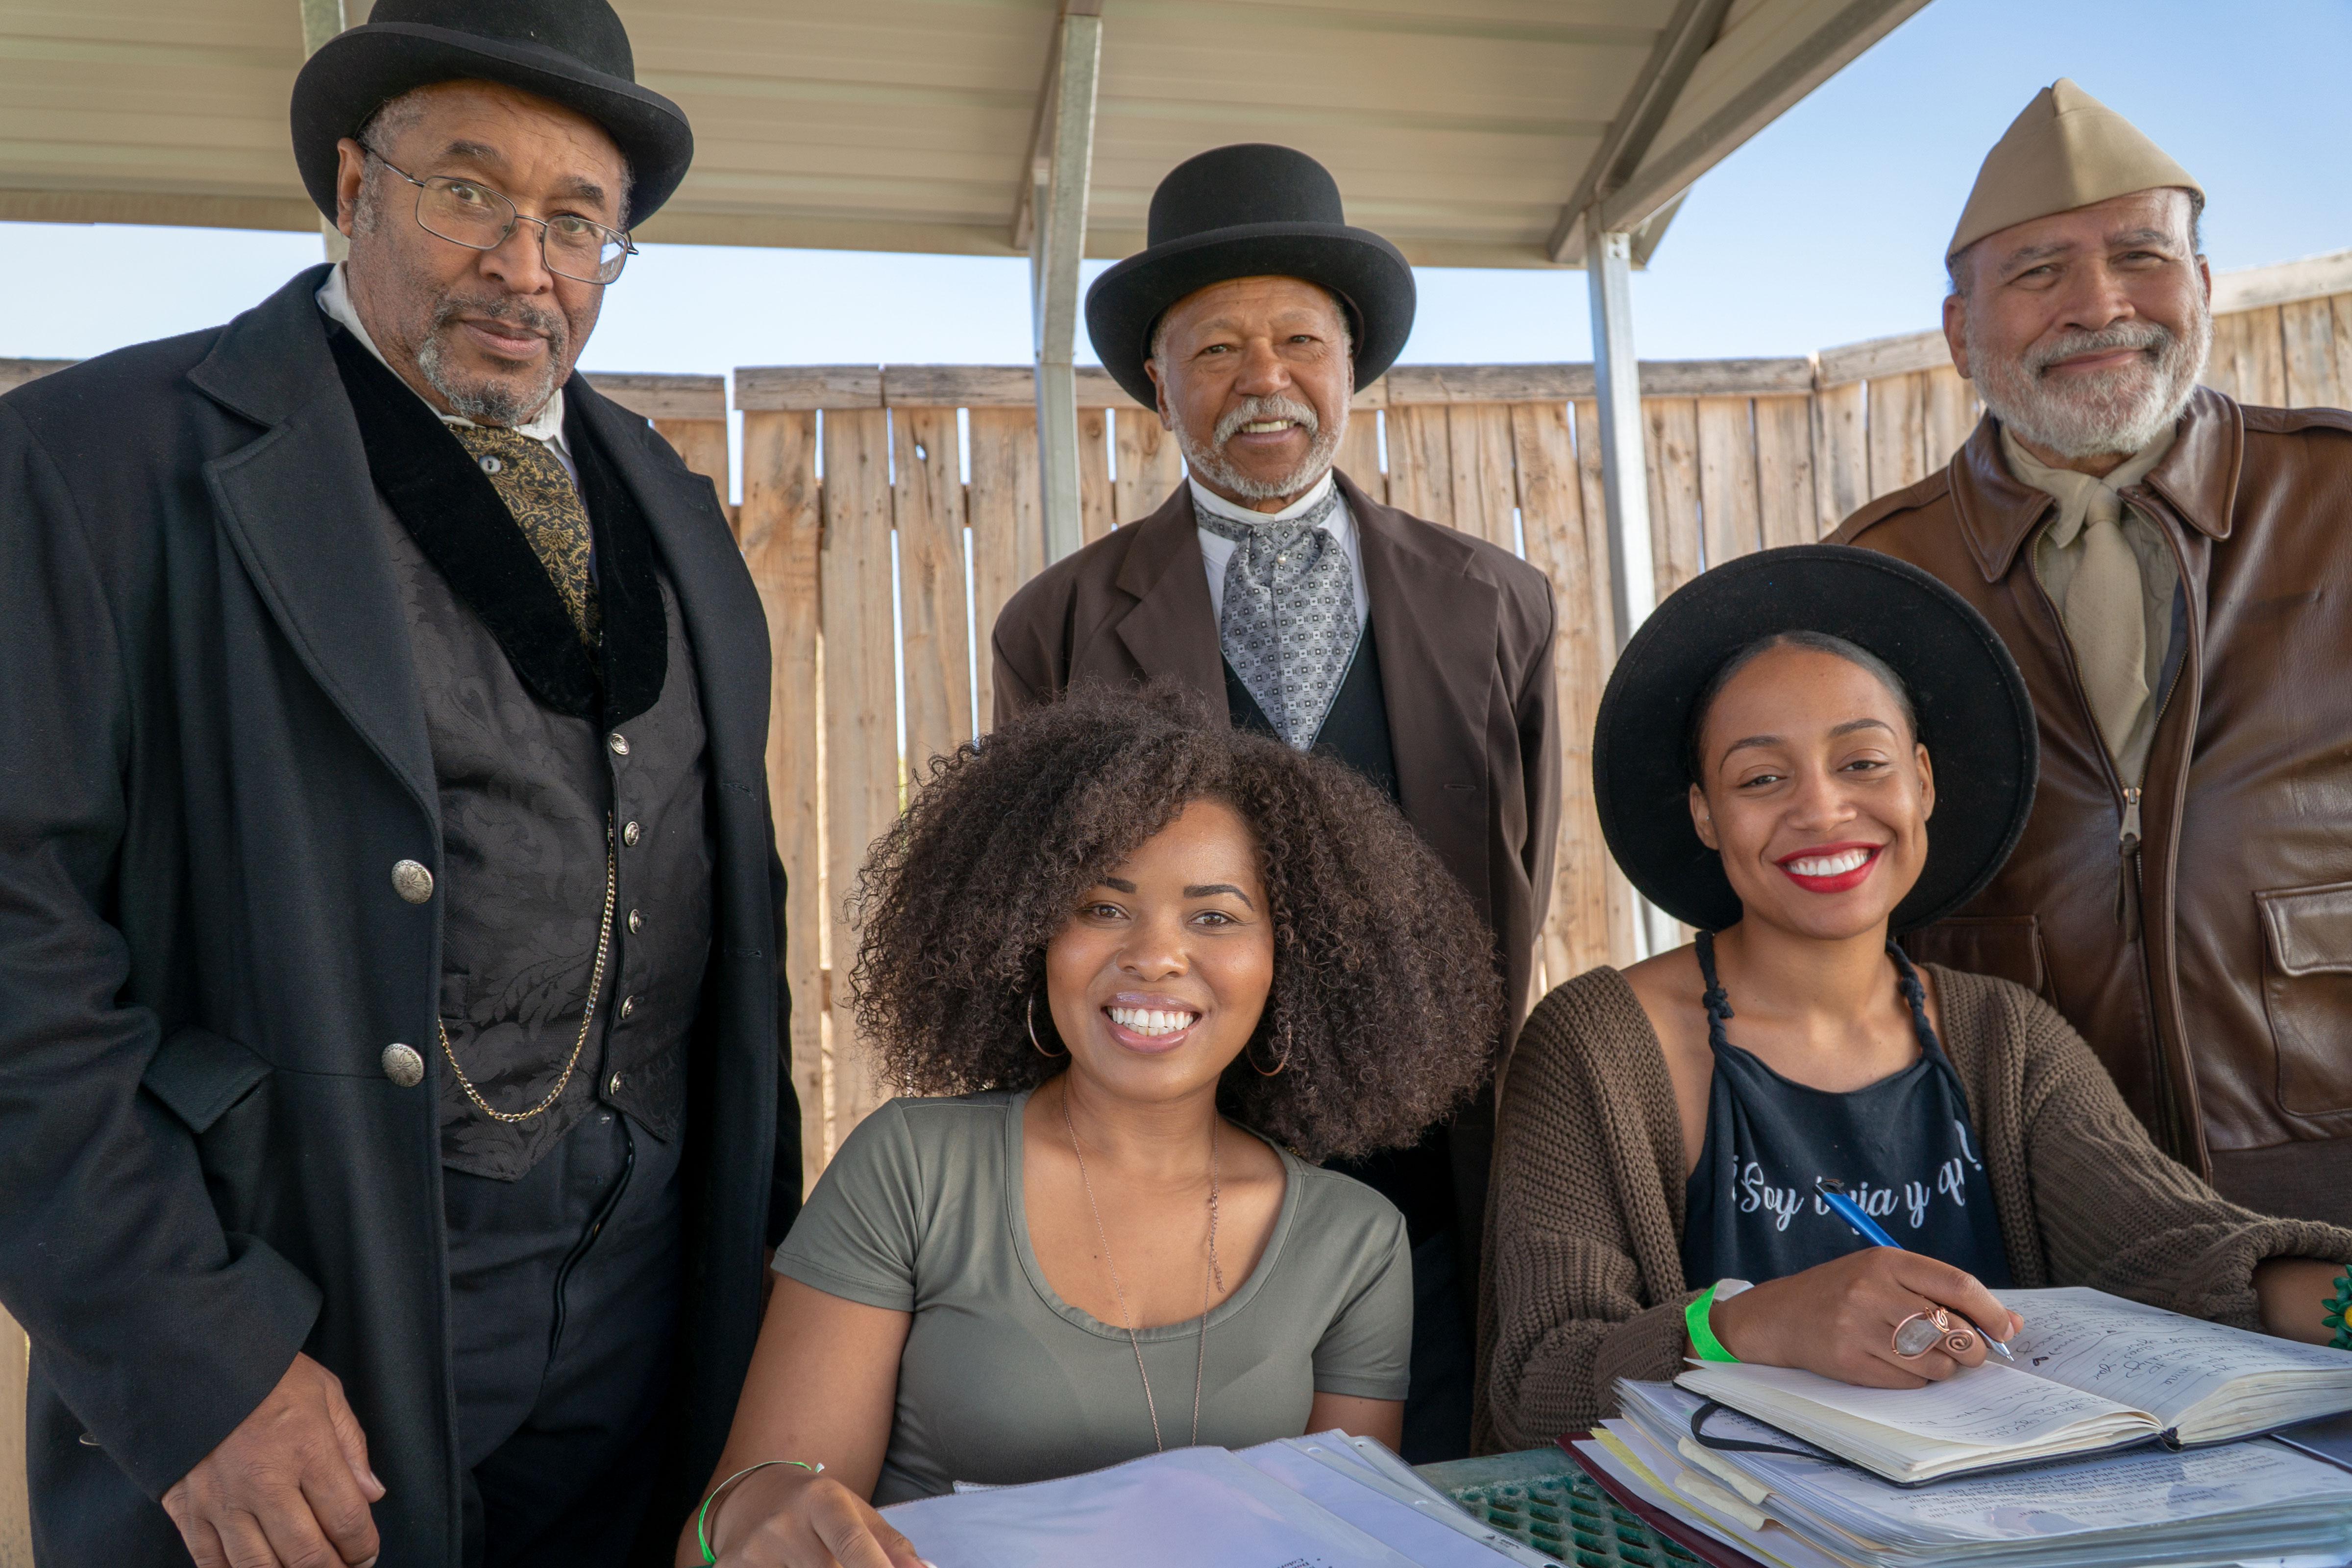 Photo: Black American West Reenactors 2 | Actors w/ Brihtney O'Brien and Shayla Monteiro - SWolf